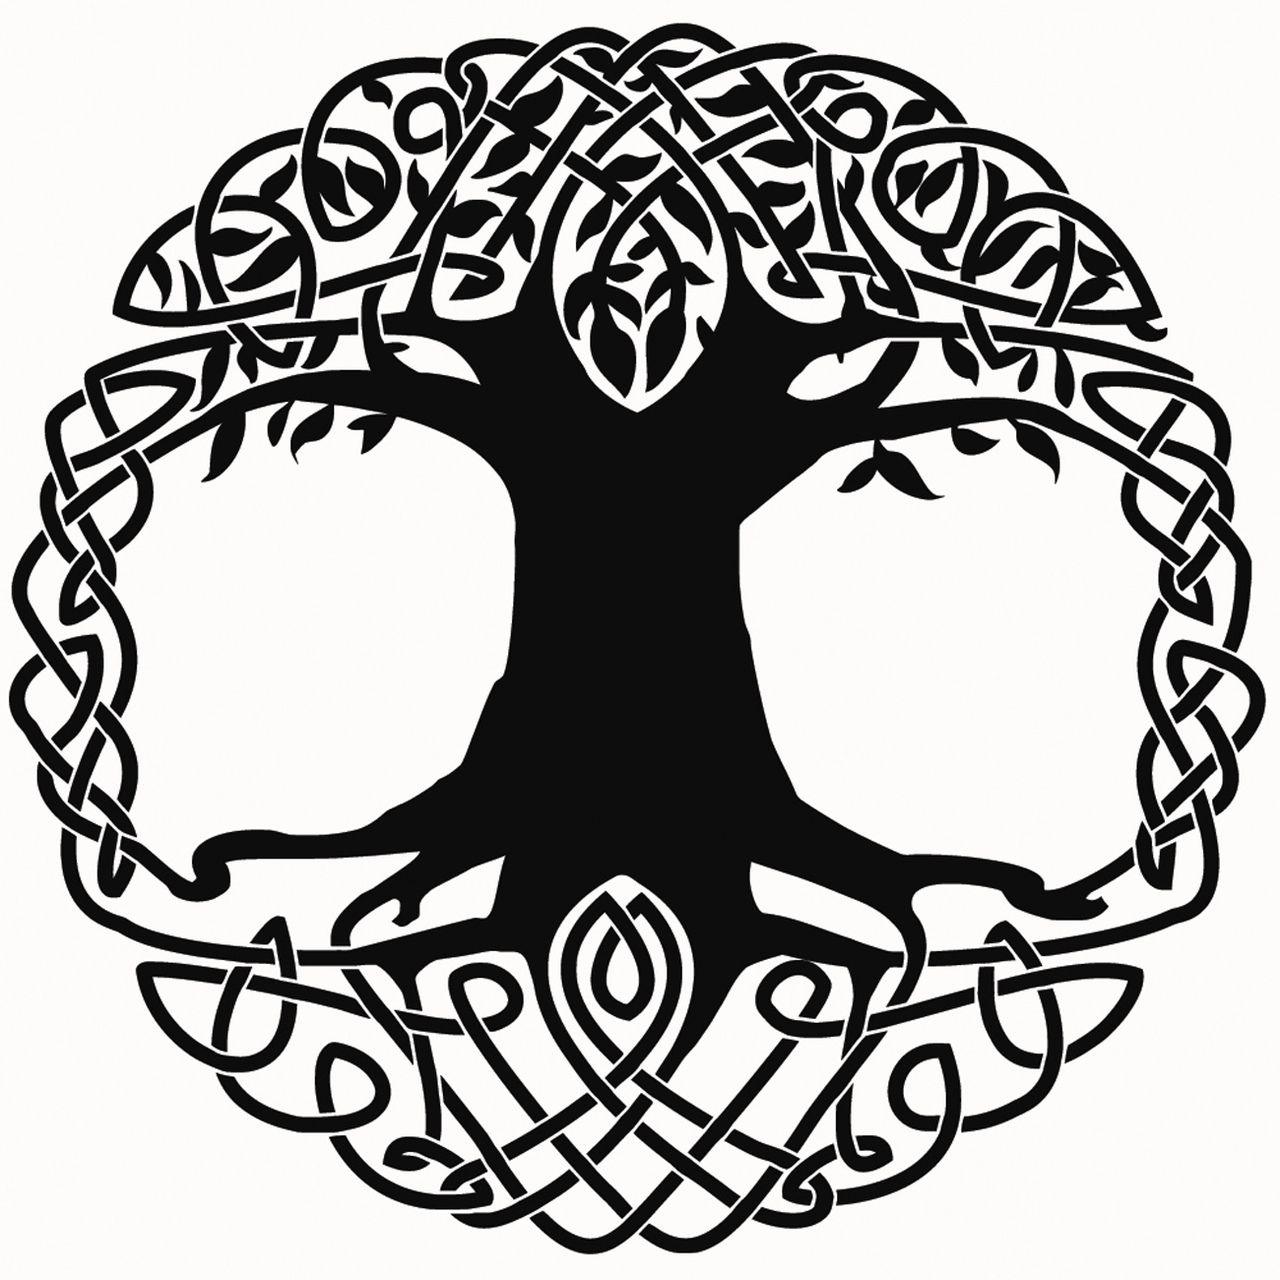 Irish Symbol For Family Tree Topsimages